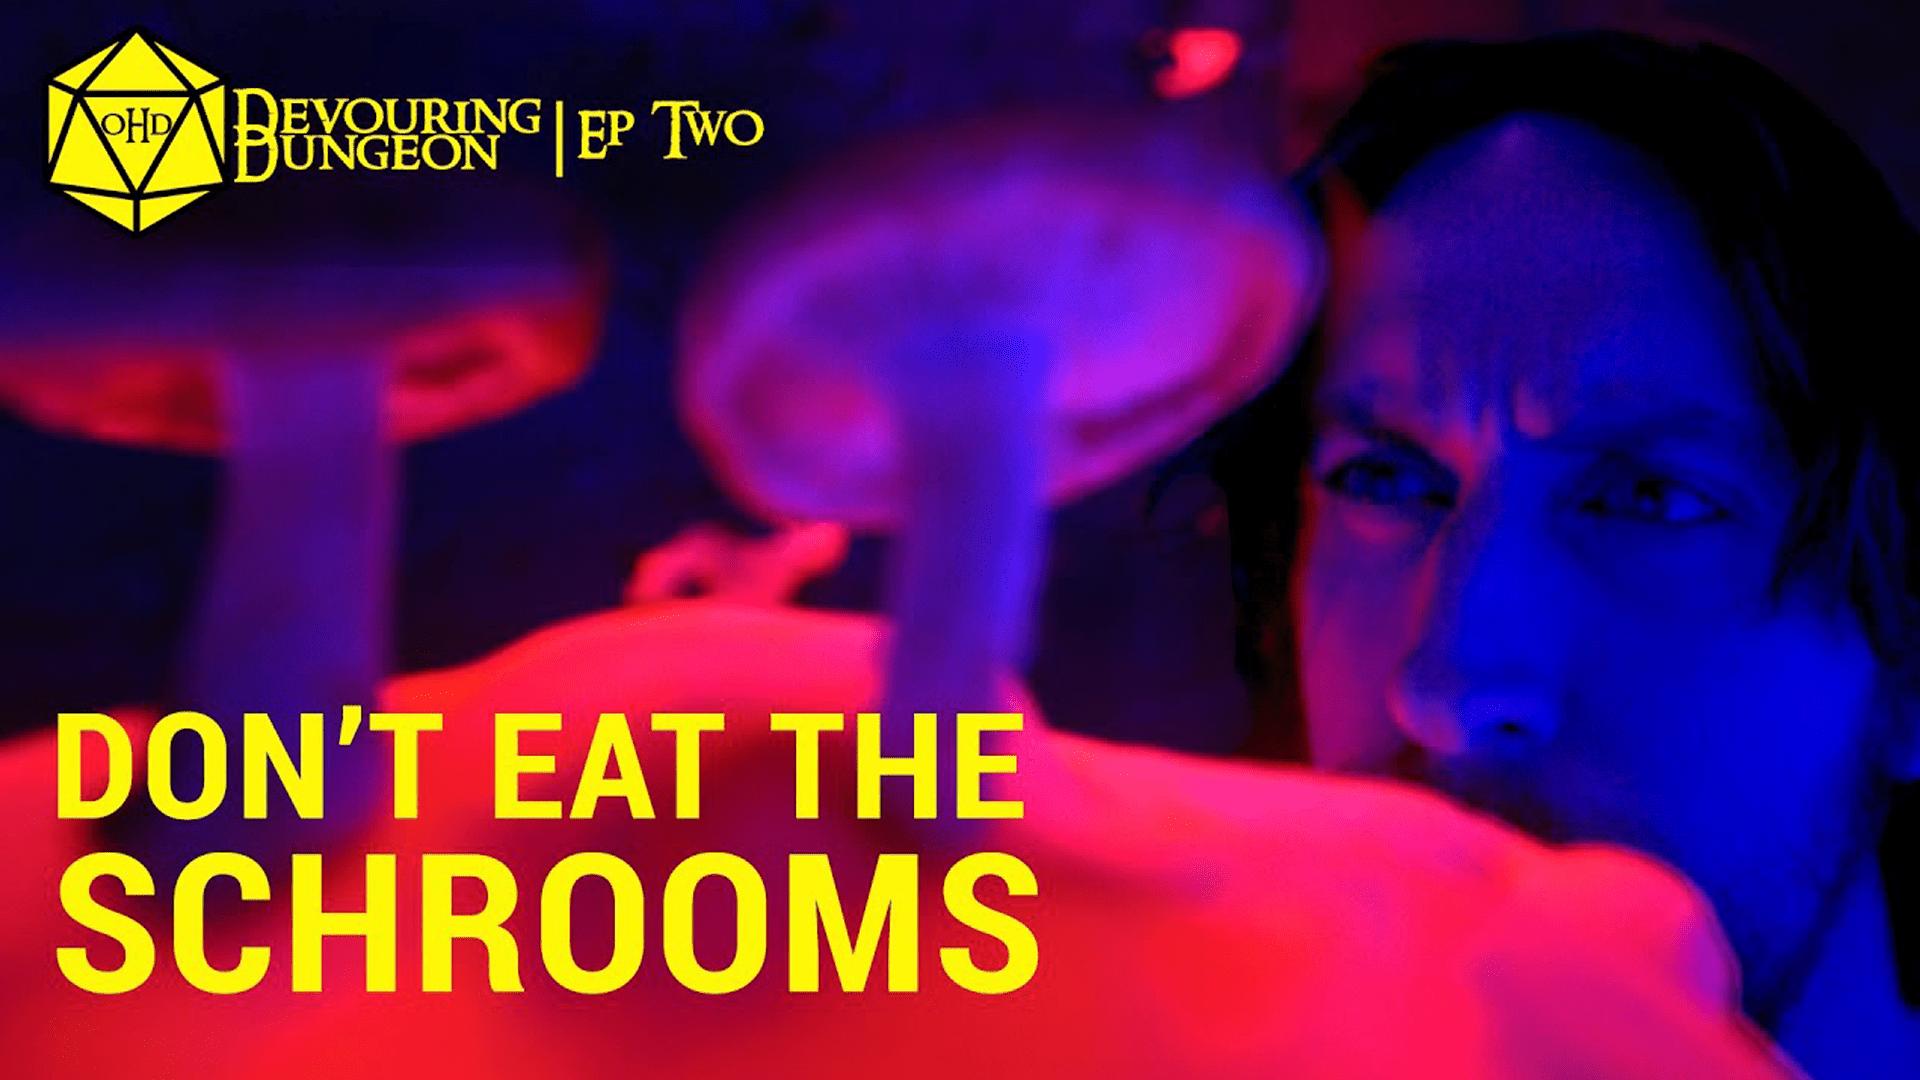 One Hit Die Devouring Dungeon Season 3 Episode 2 Don't Eat the Schrooms